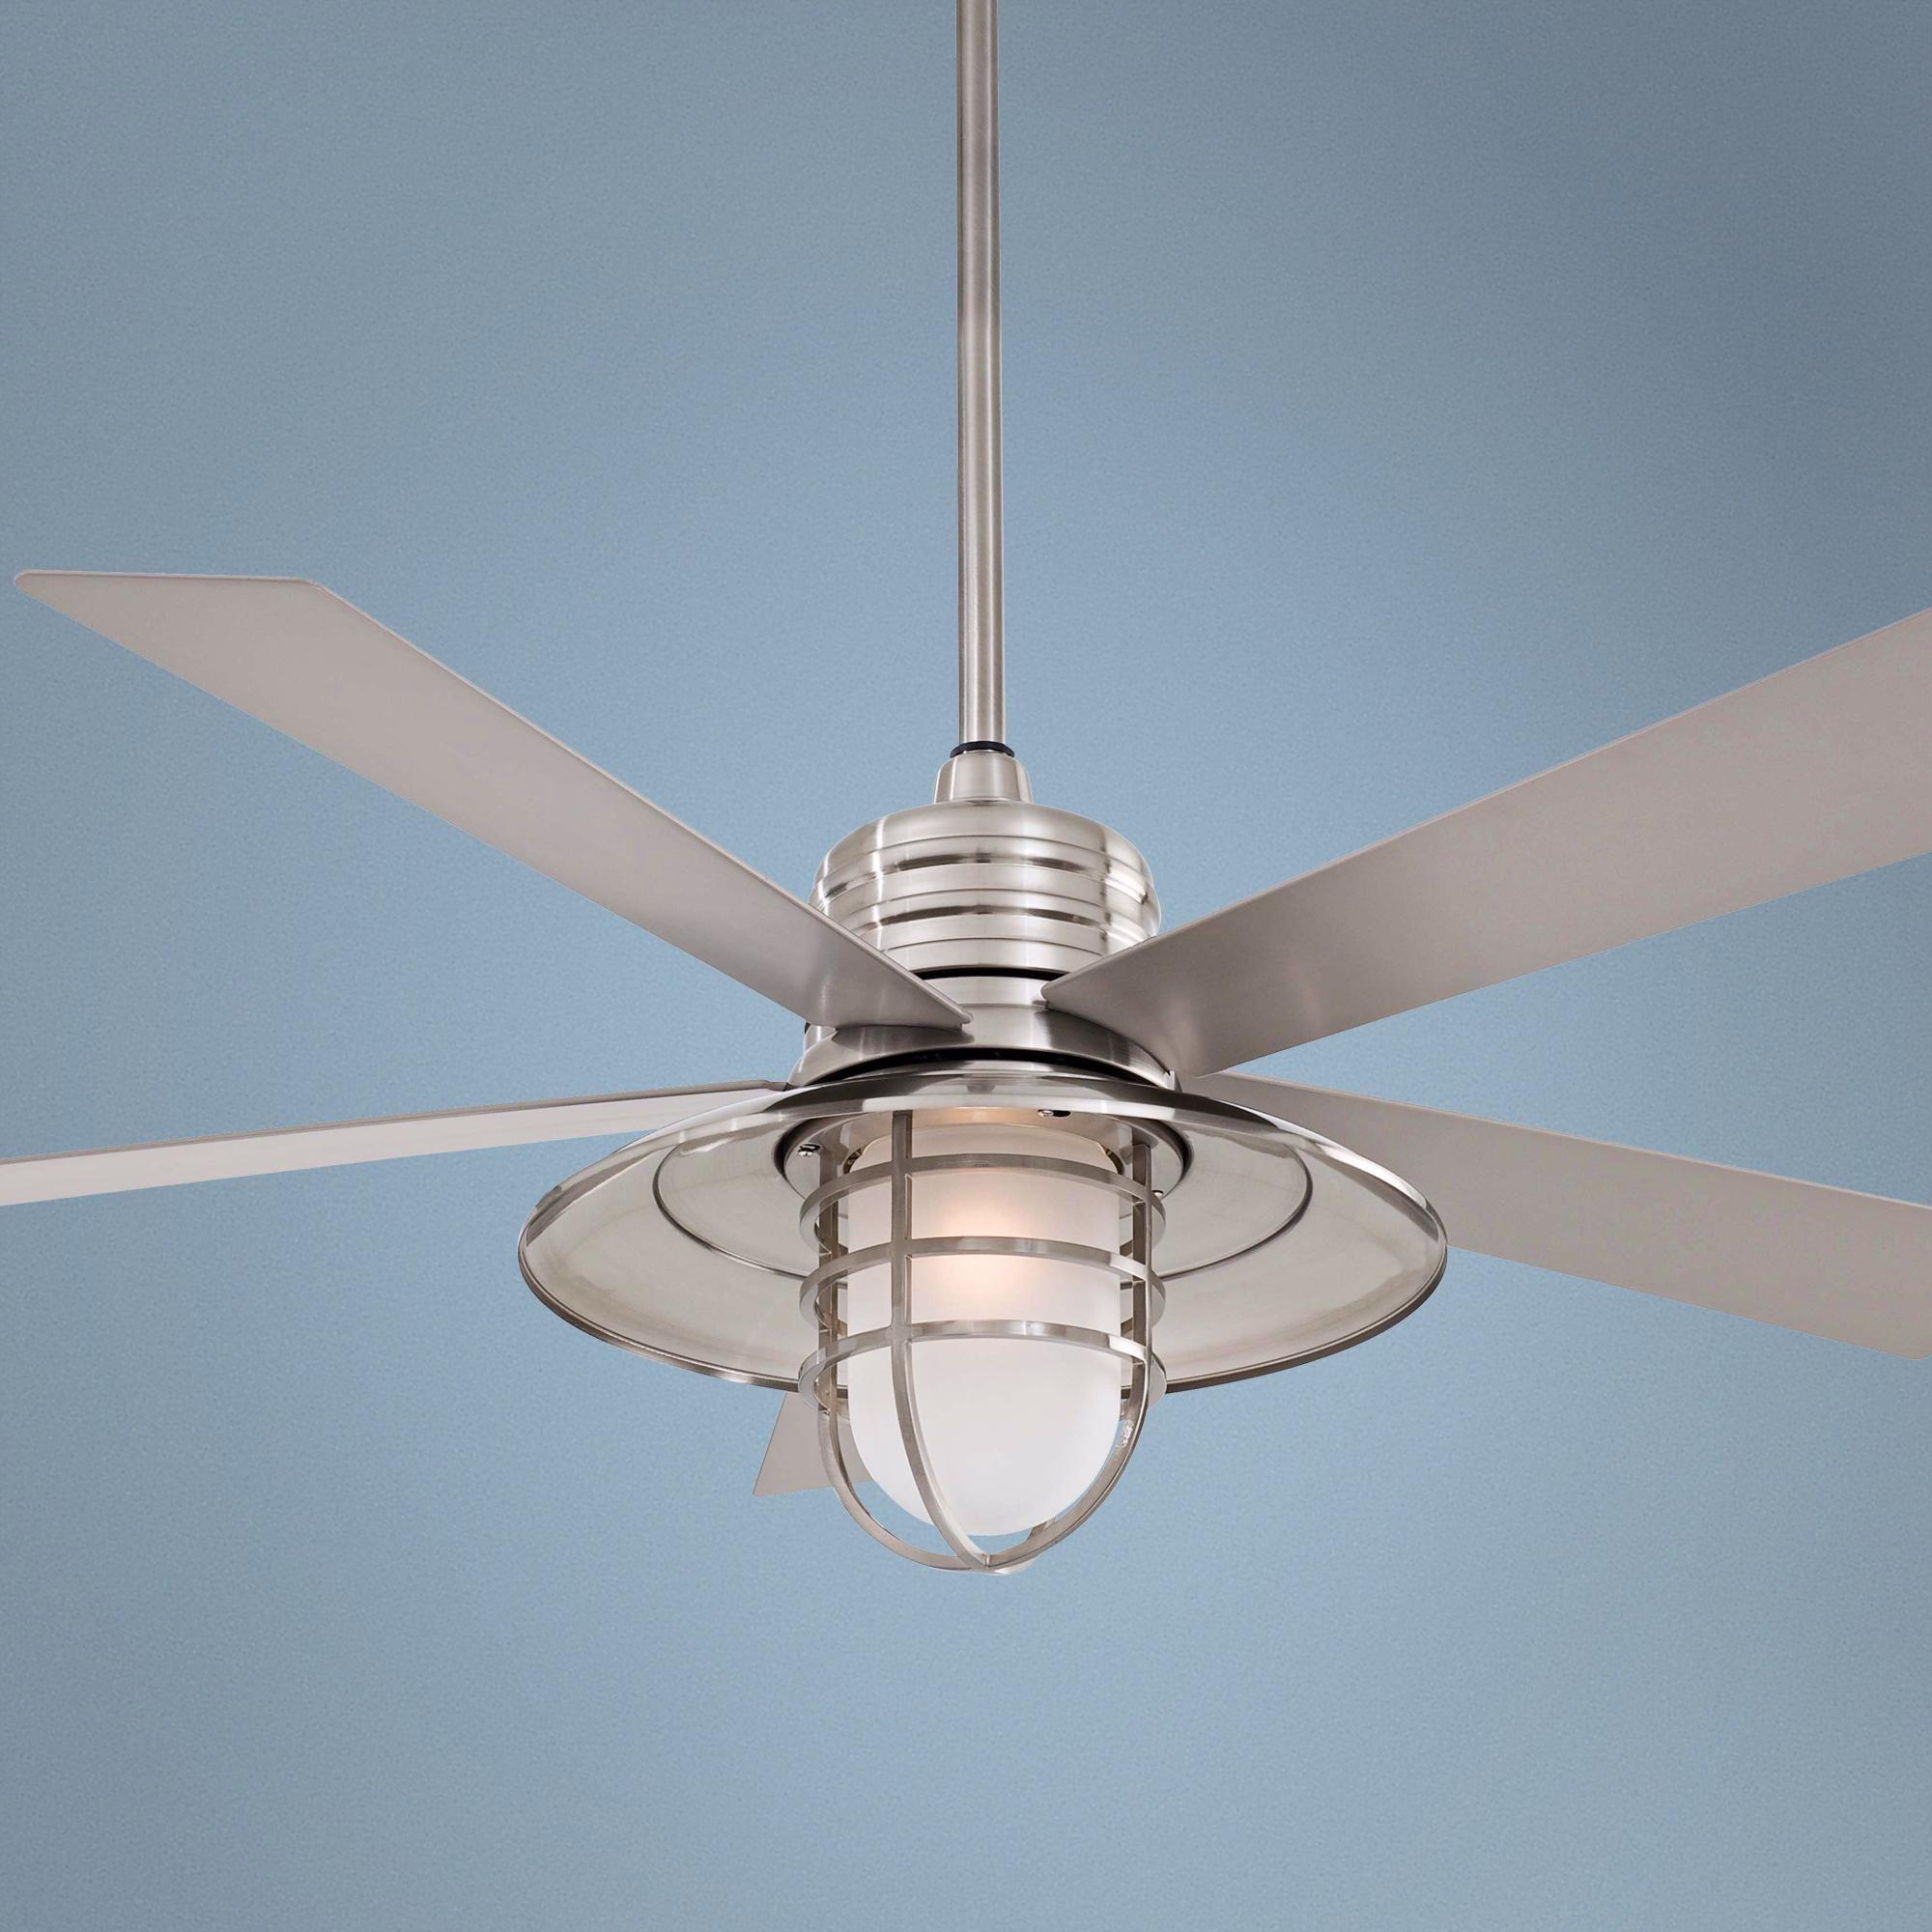 54 Minka Aire Rainman Brushed Nickel Ceiling Fan